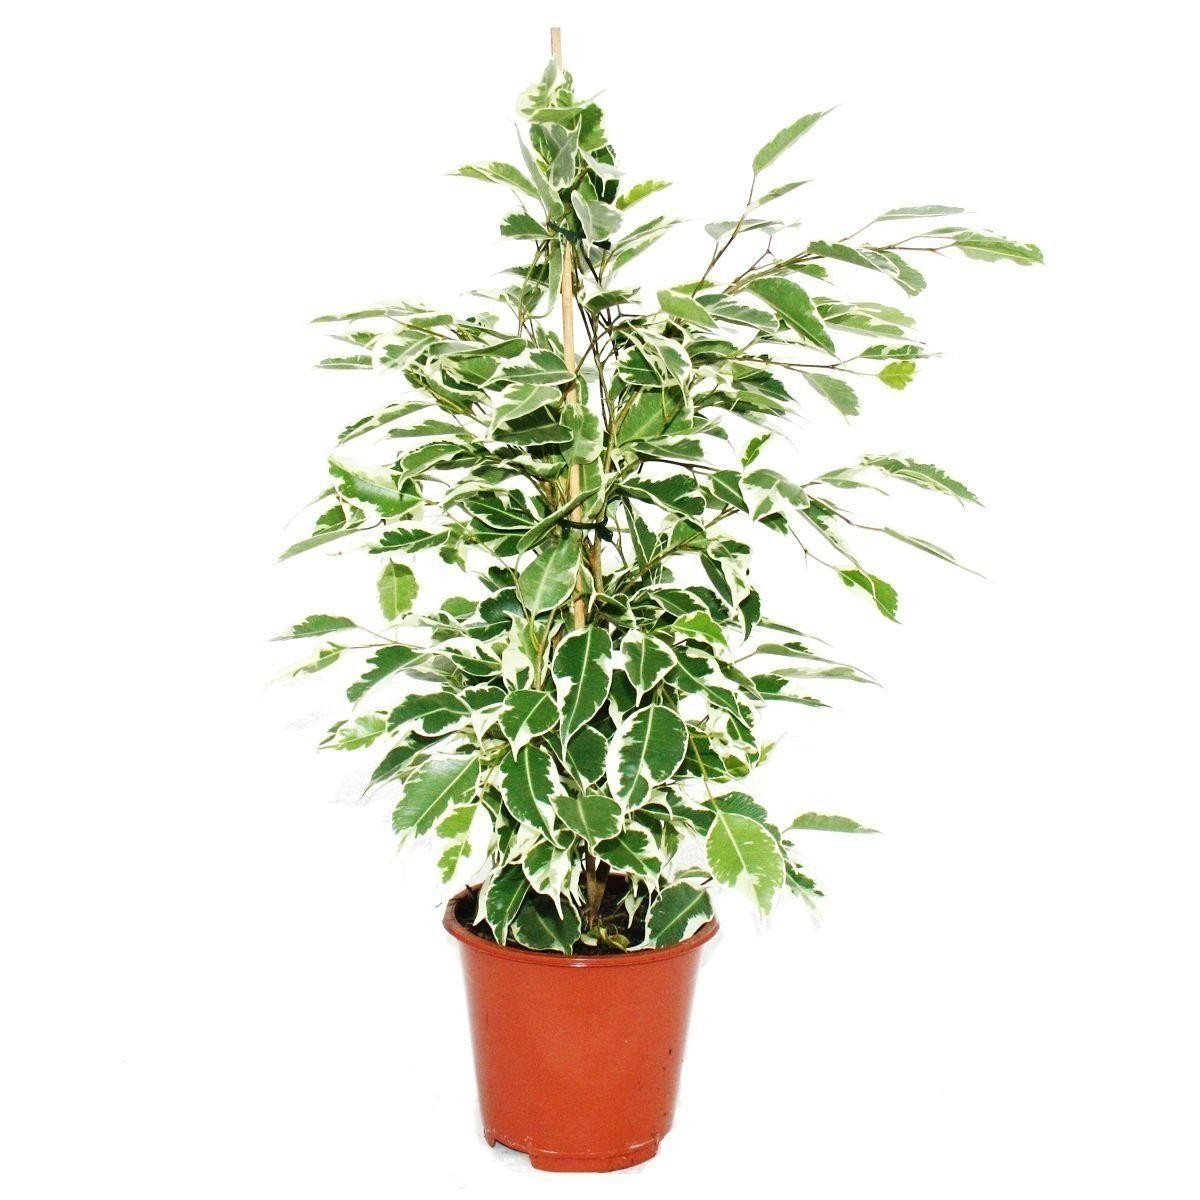 комнатное растение фикус бенджамина уход фото рэйнер известен благодаря